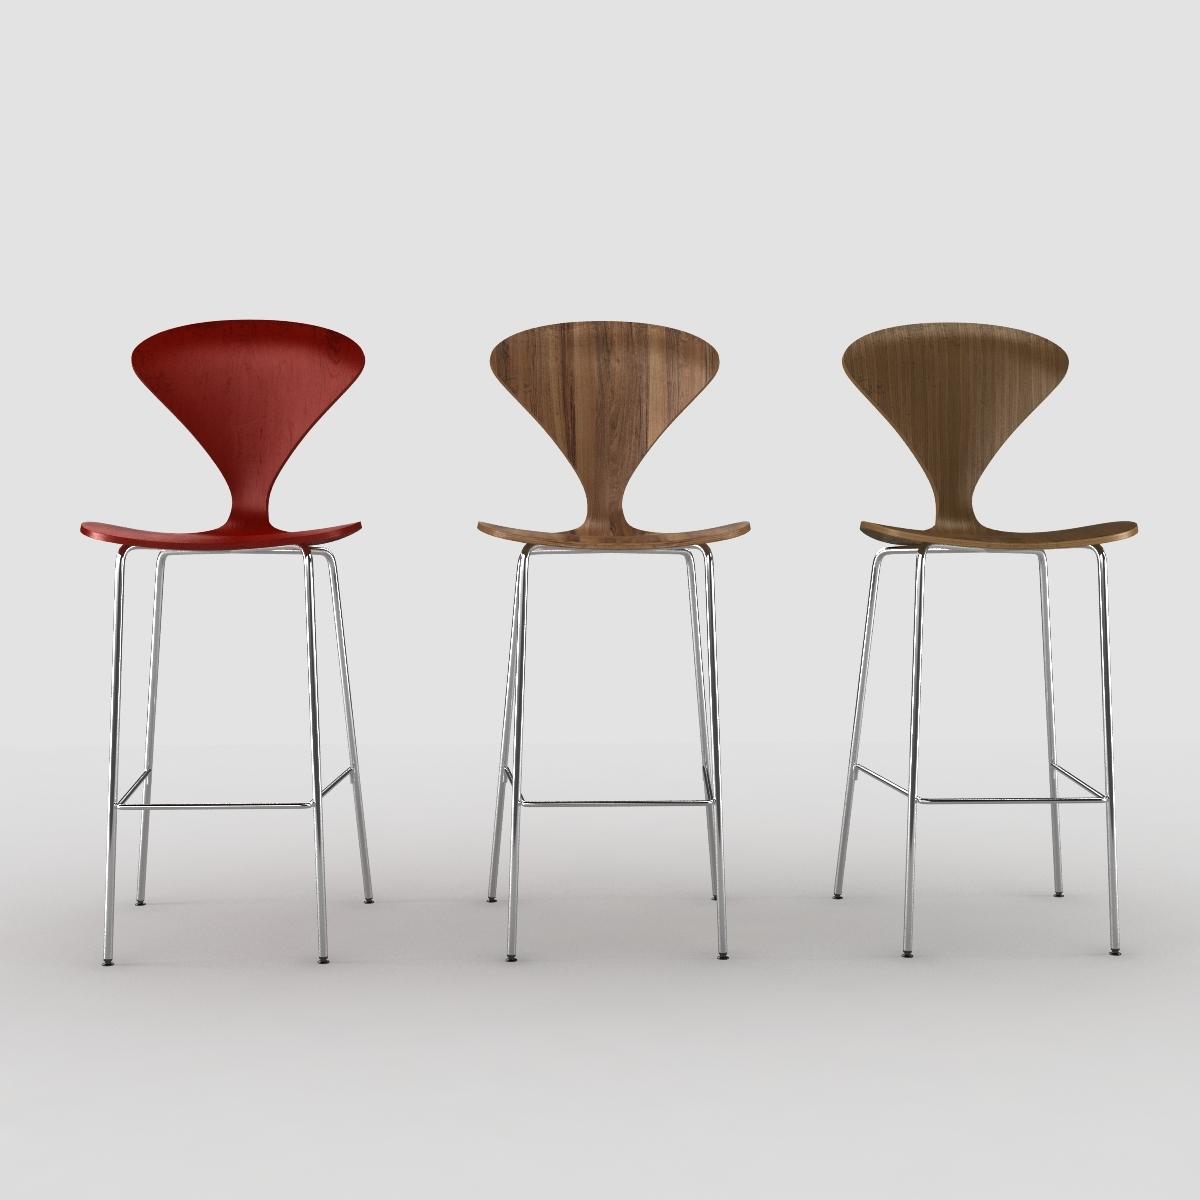 Swell Cherner Stool Chair Metal Leg Machost Co Dining Chair Design Ideas Machostcouk